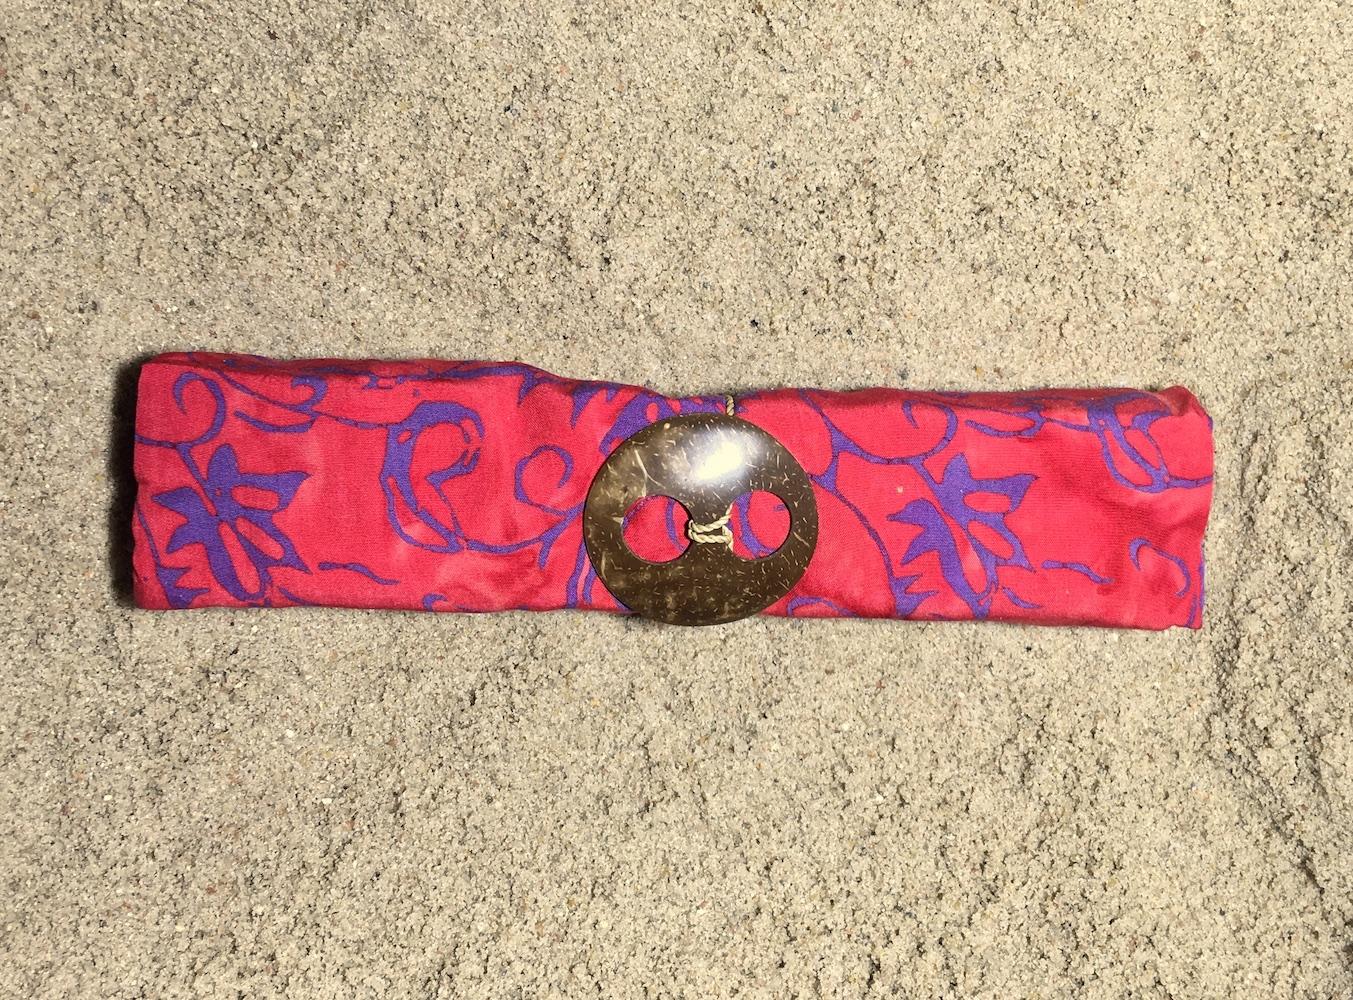 1-6018 Banjar: pudriges himbeerrot und violette Ornamente